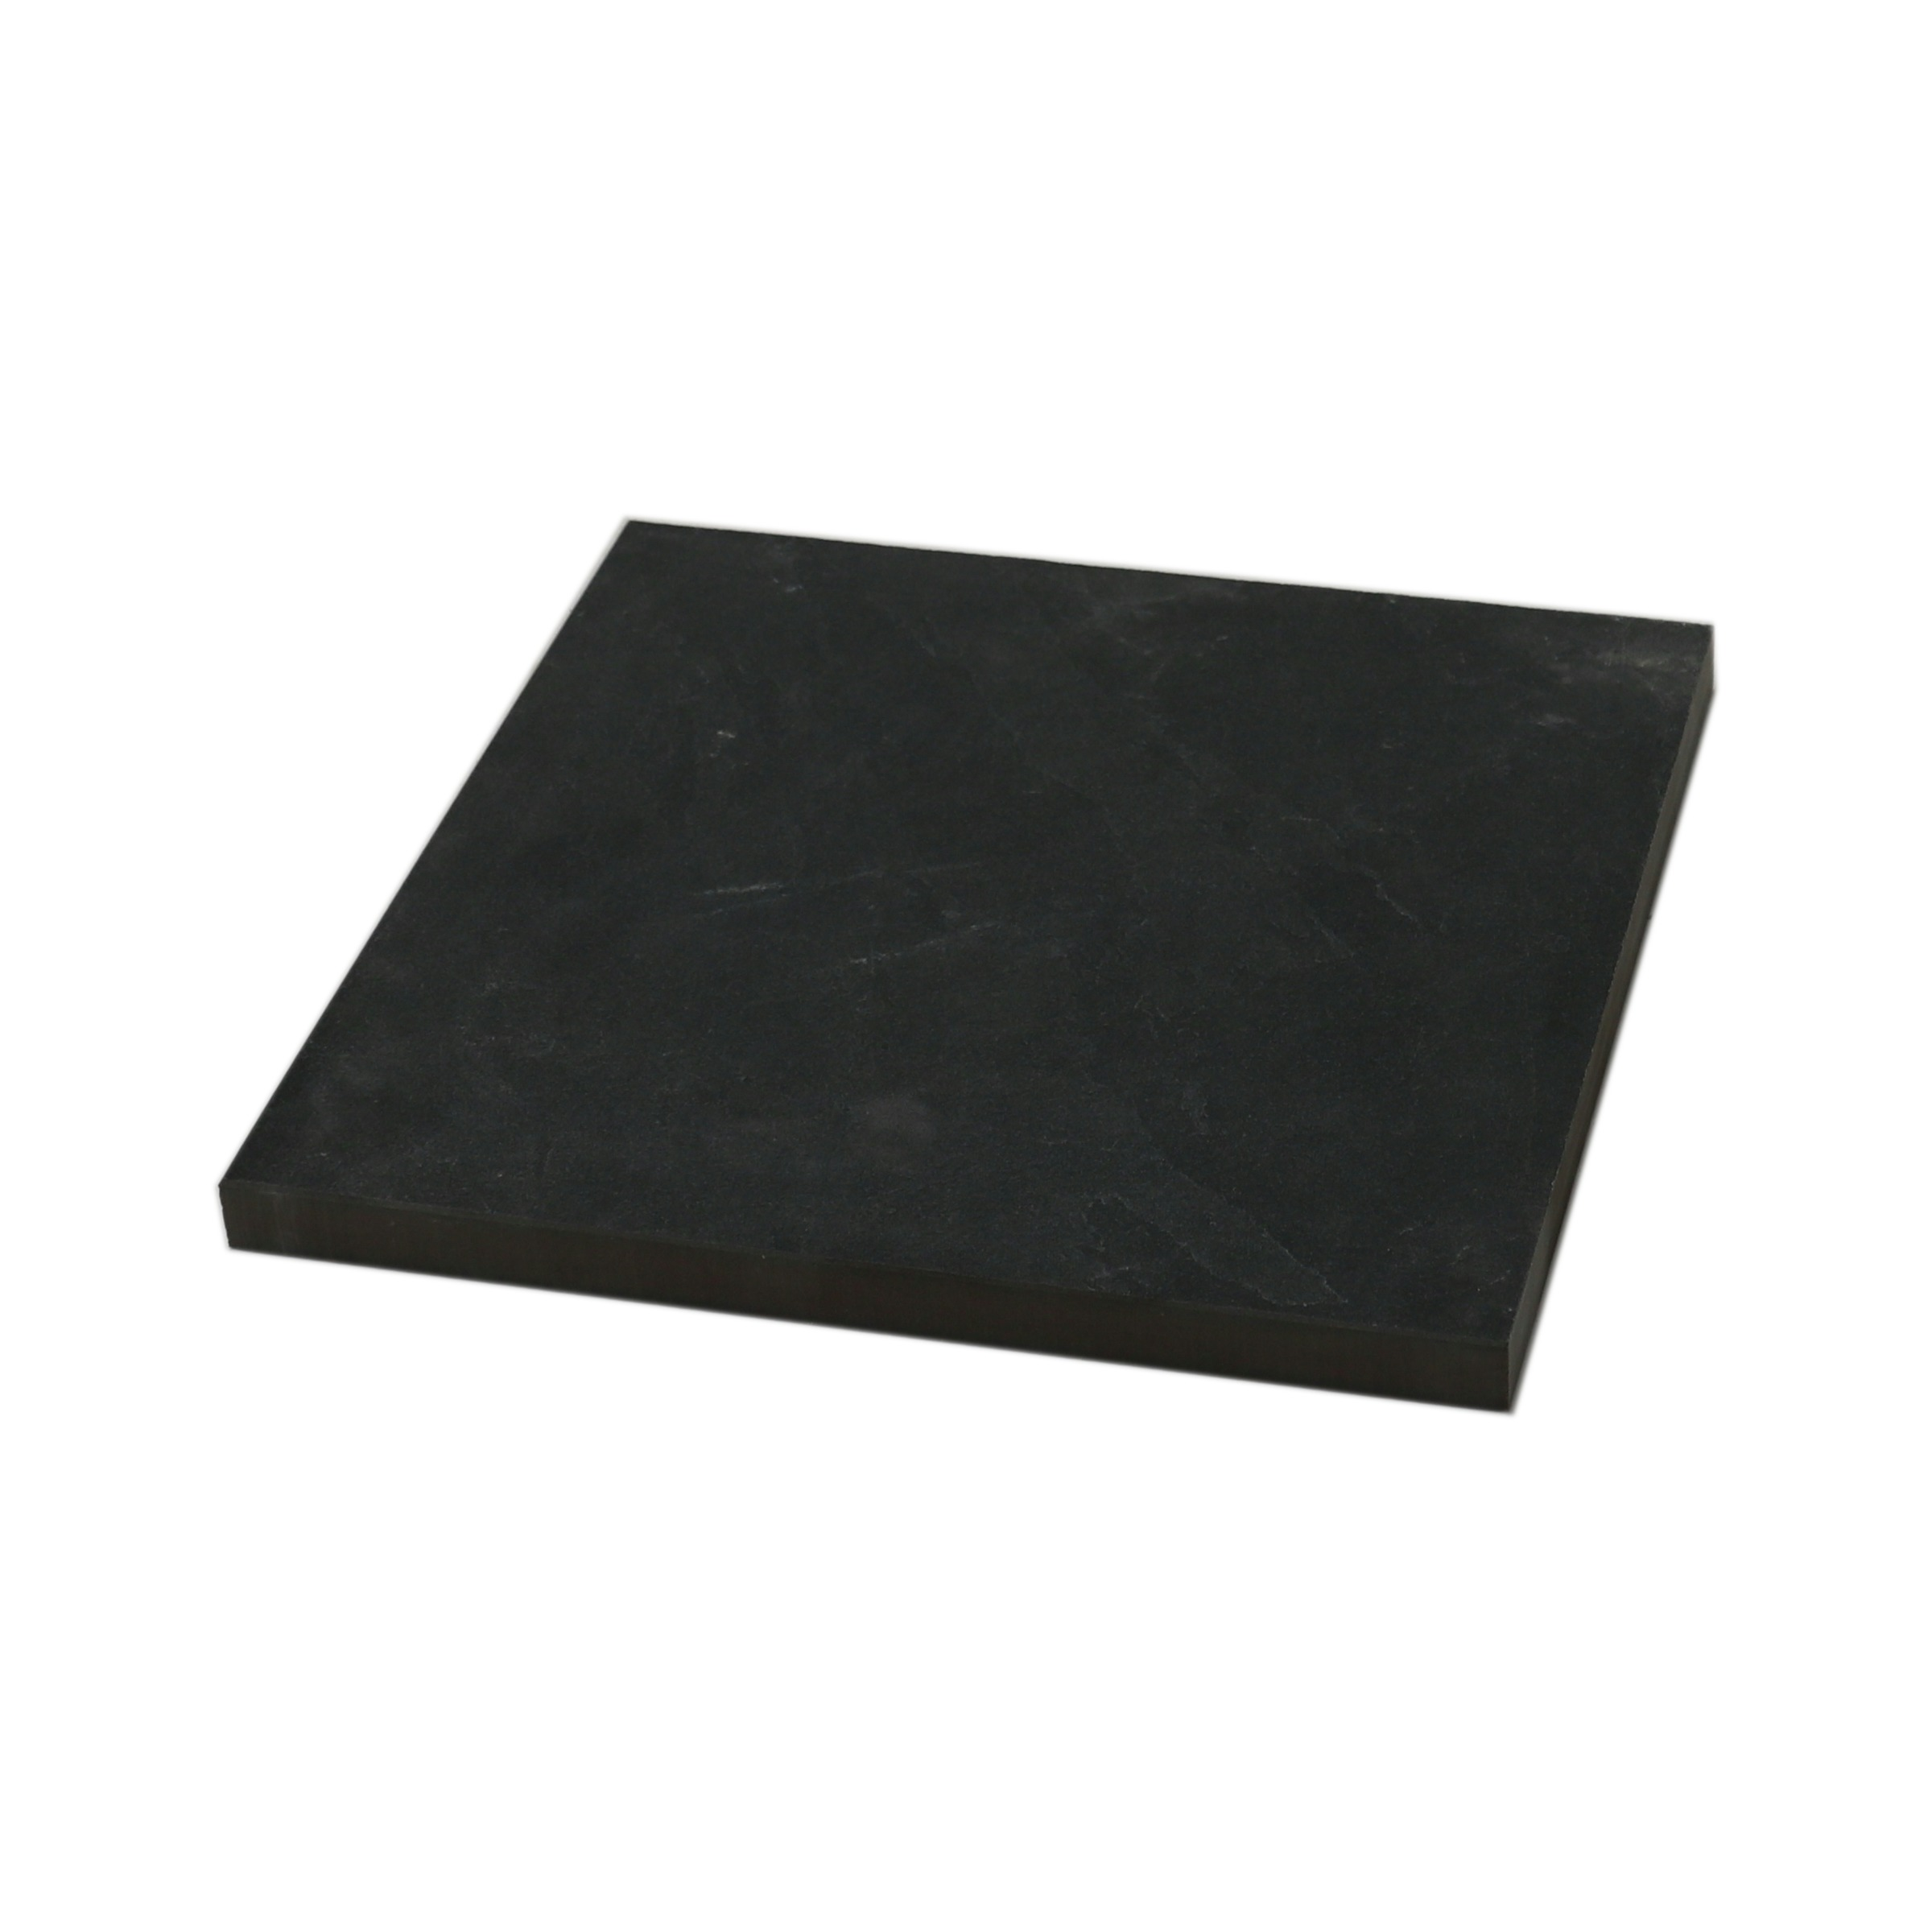 Terrastegel Keramisch Slate Zwart 60x60 cm - 2 Tegels - 0,72 m2